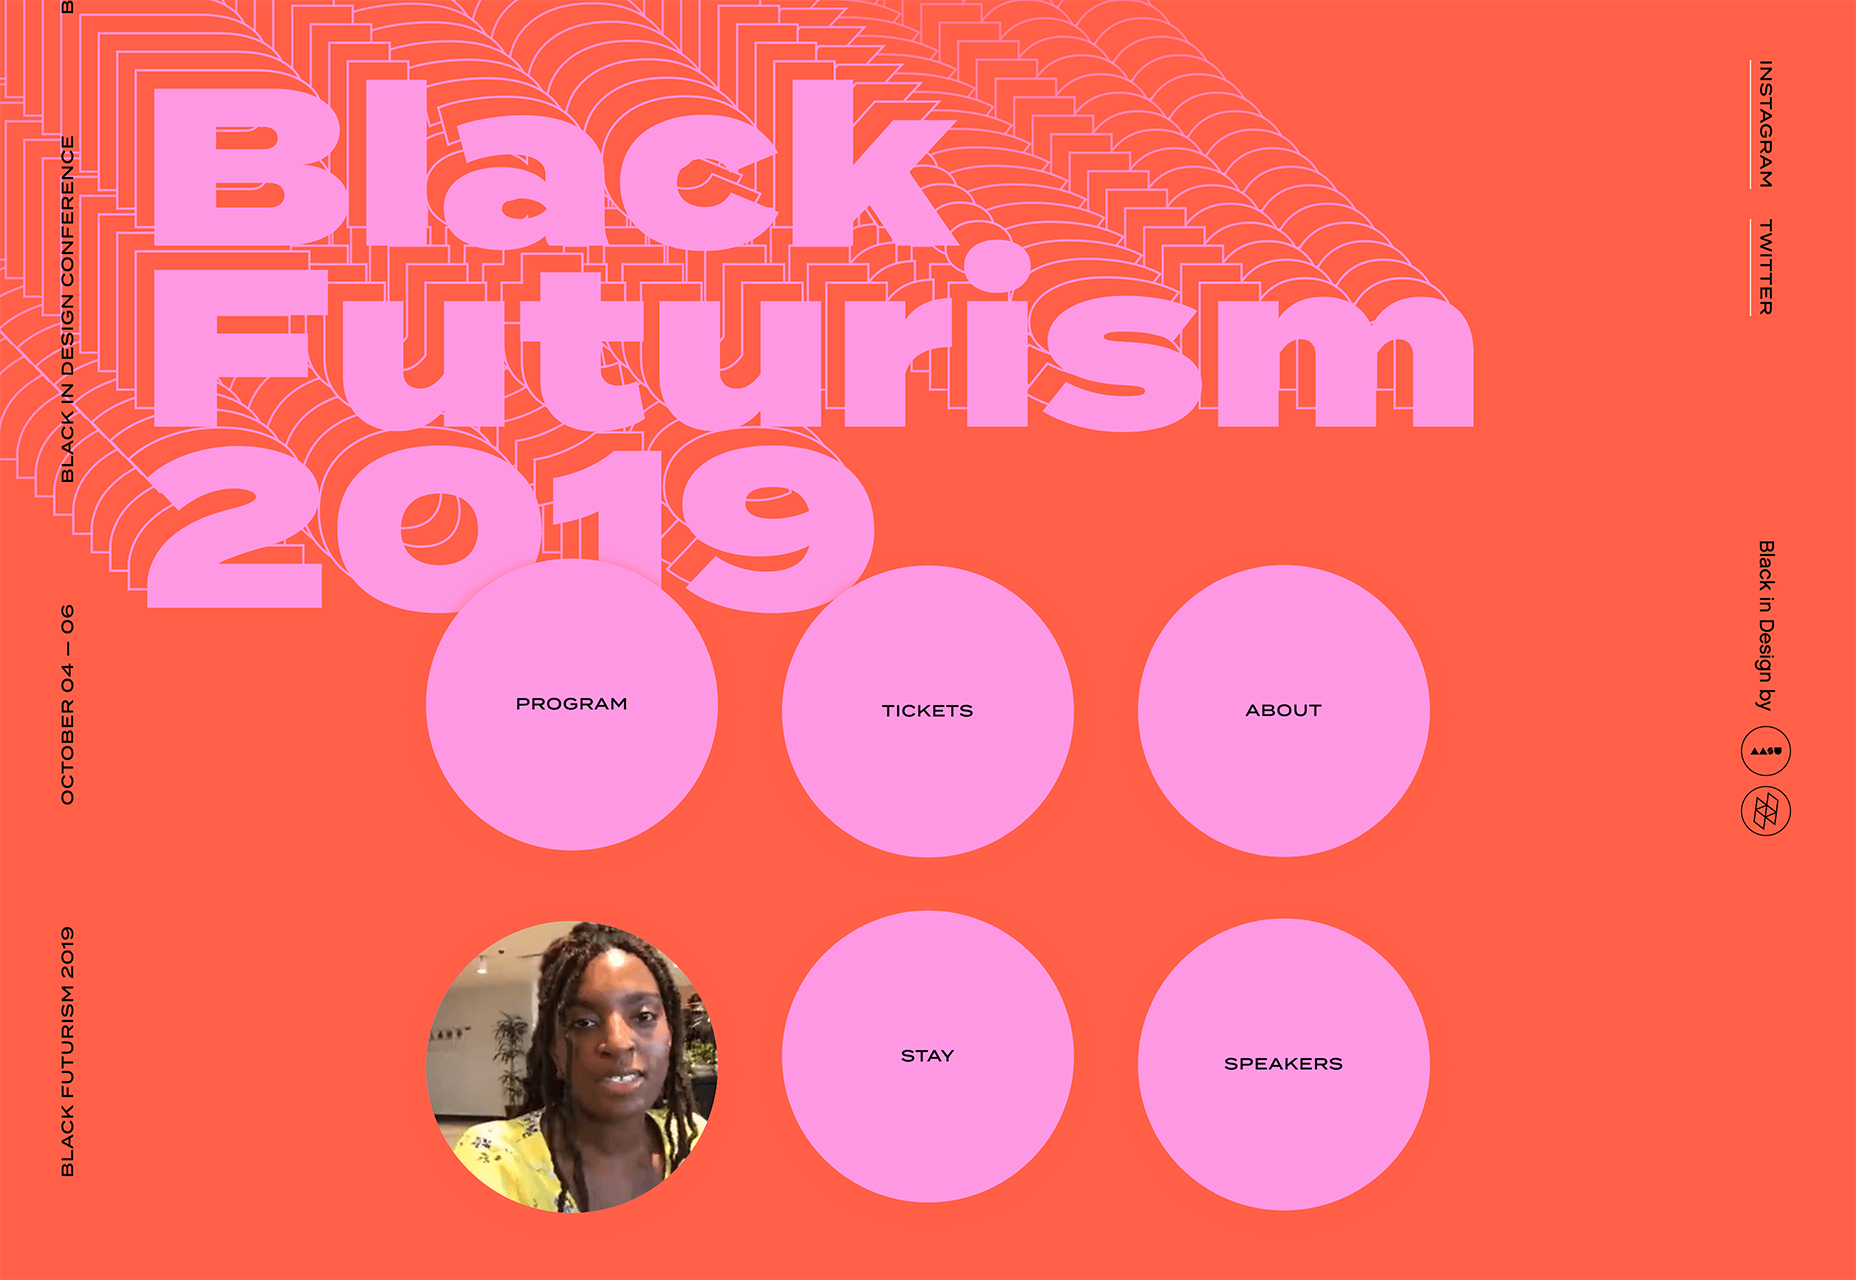 015-blackfuturism2019